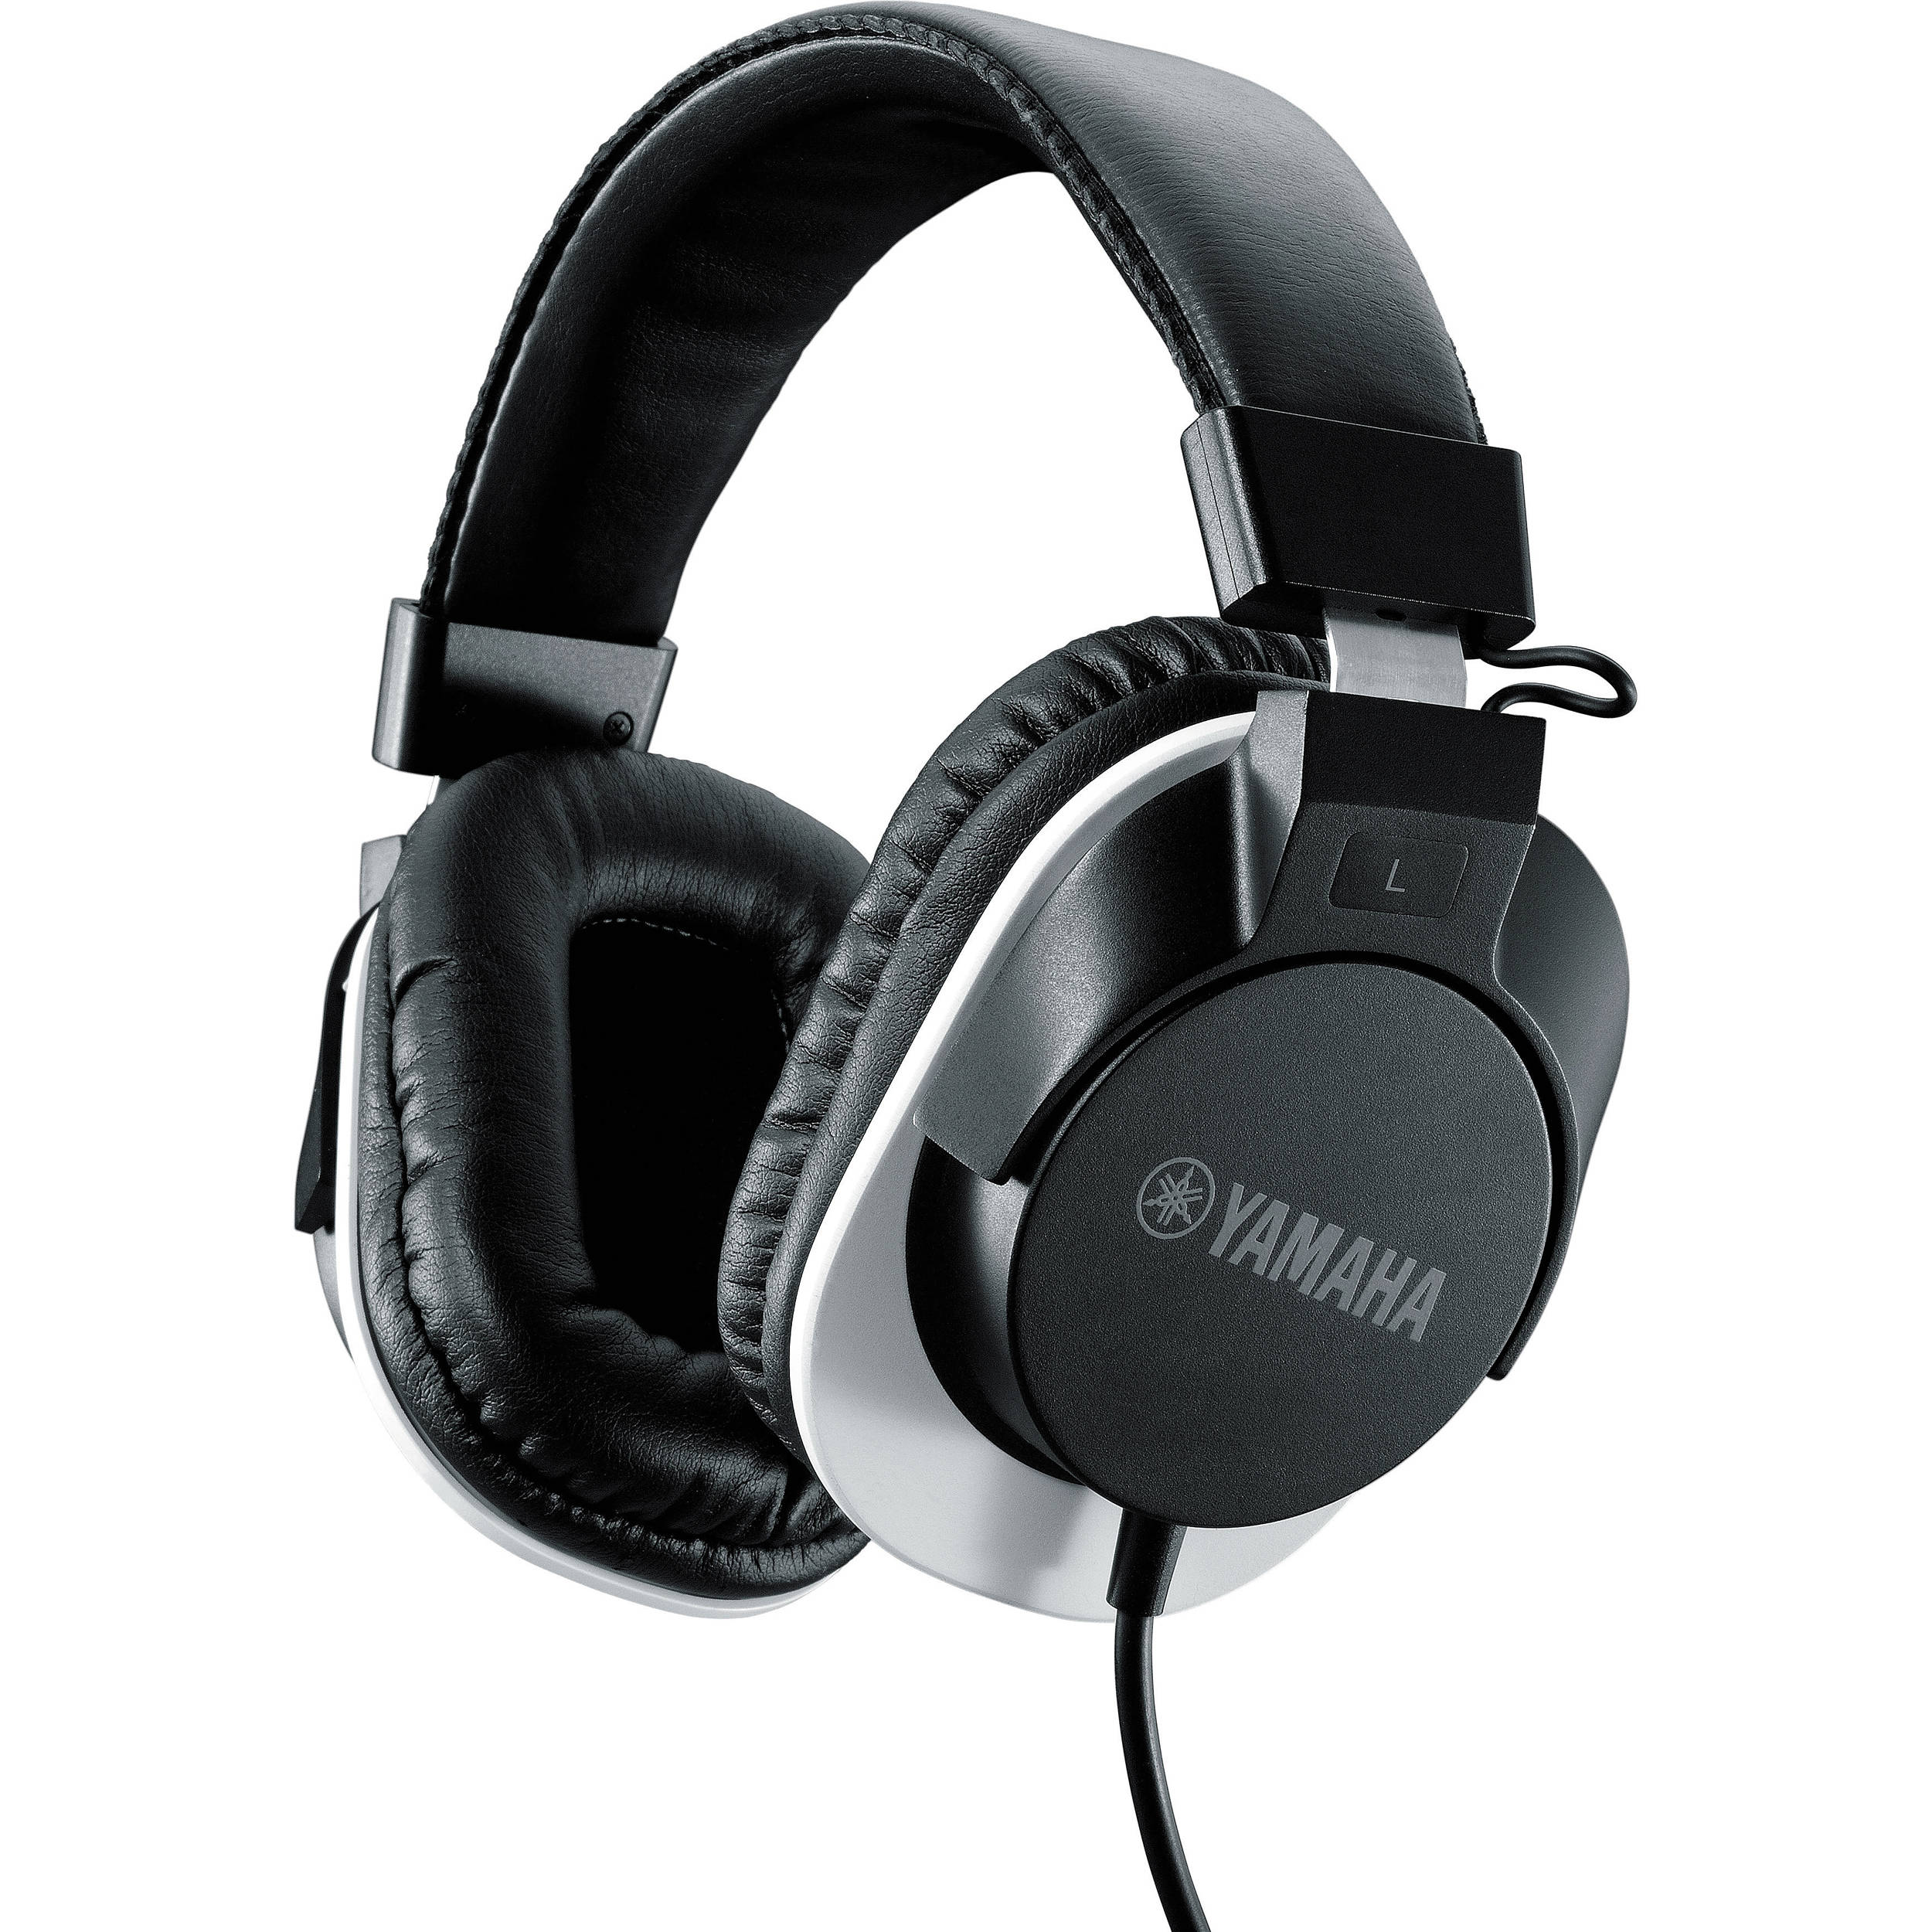 yamaha hph mt120 studio monitor headphones black hph mt120bl. Black Bedroom Furniture Sets. Home Design Ideas